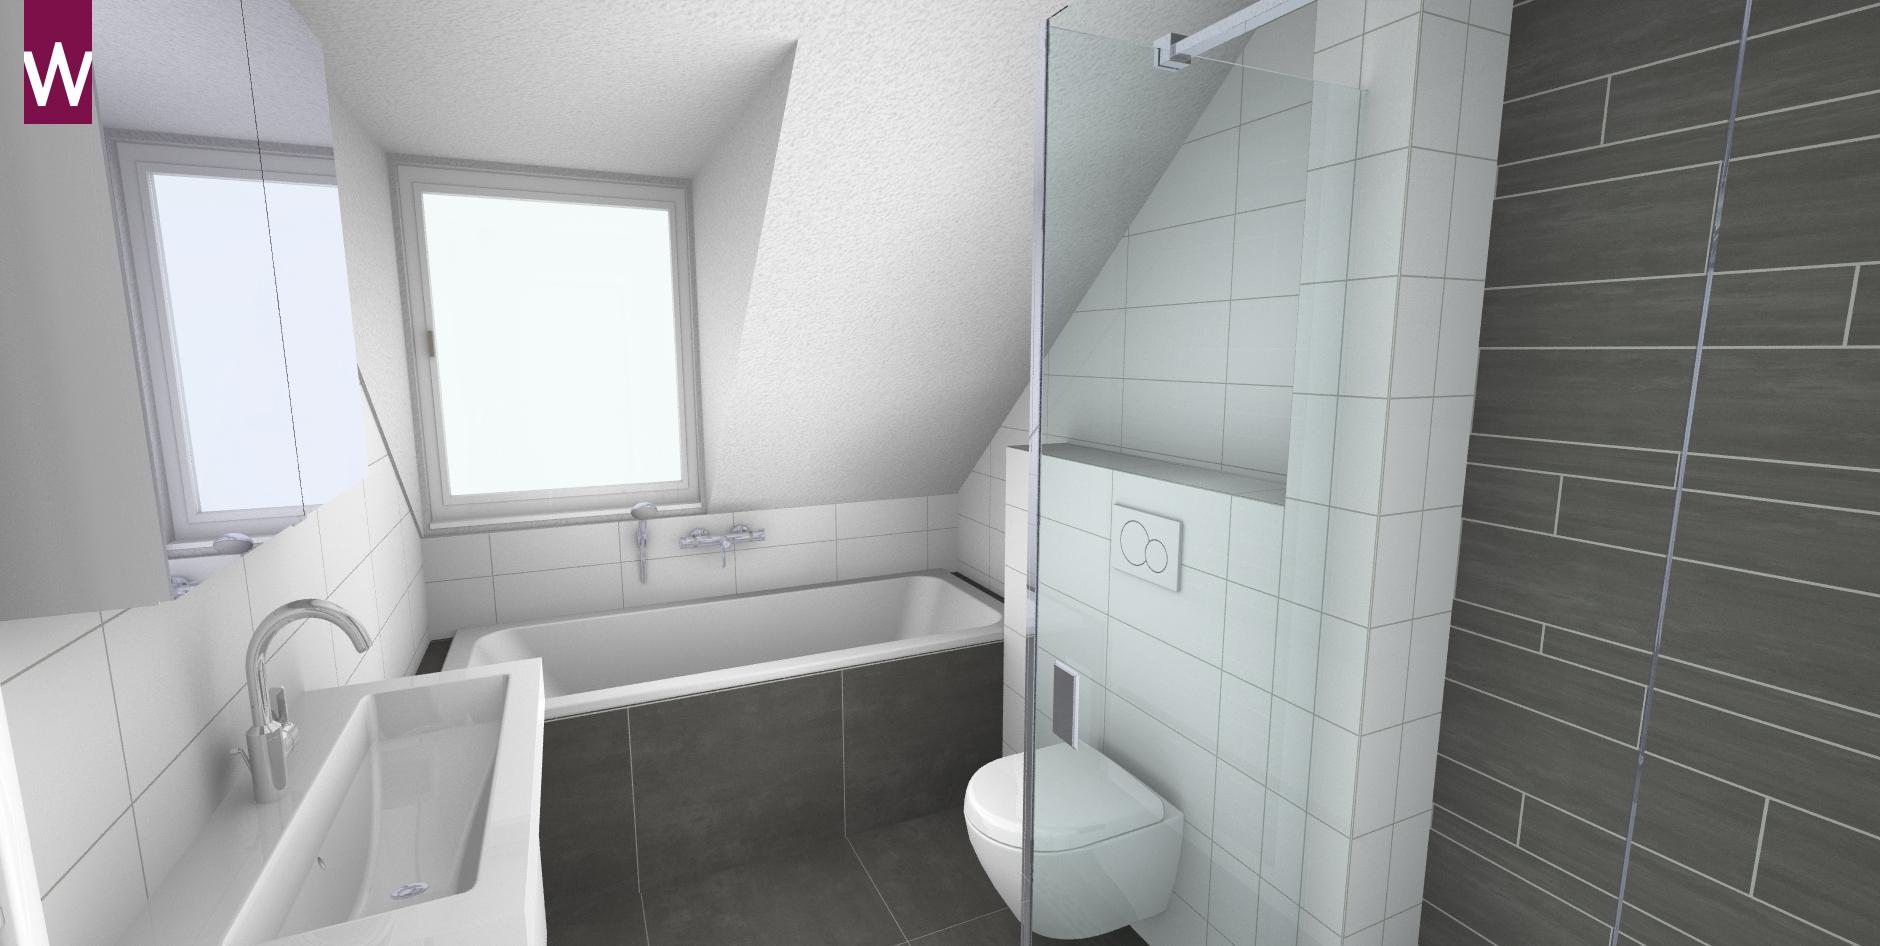 Schuin dak idee badkamer - Idee amenagement zolder klein volume ...